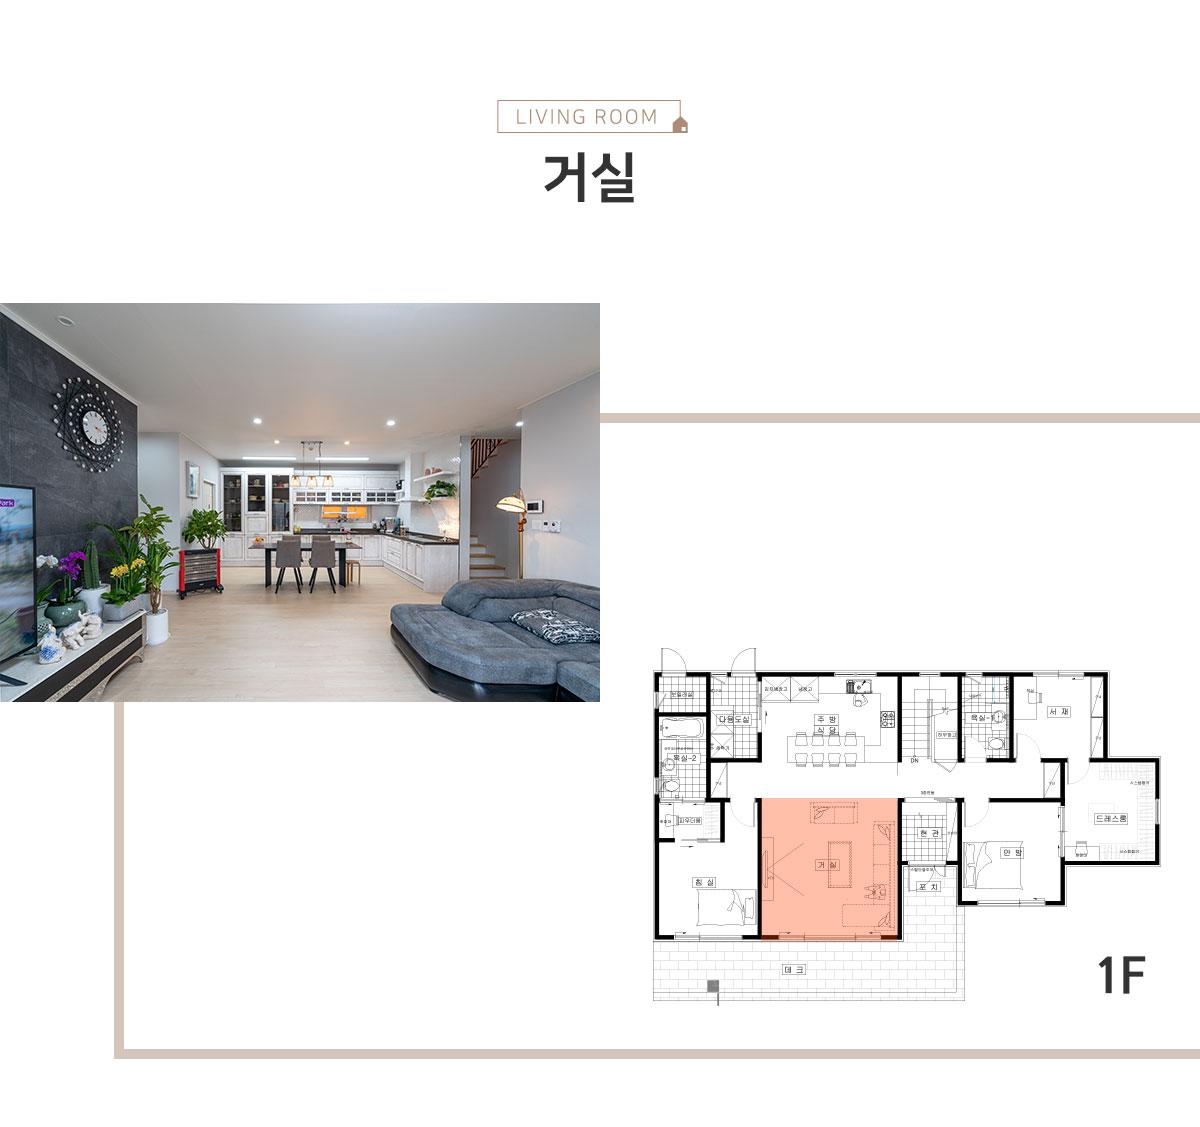 003_living-room_인천강화_김00_01.jpg